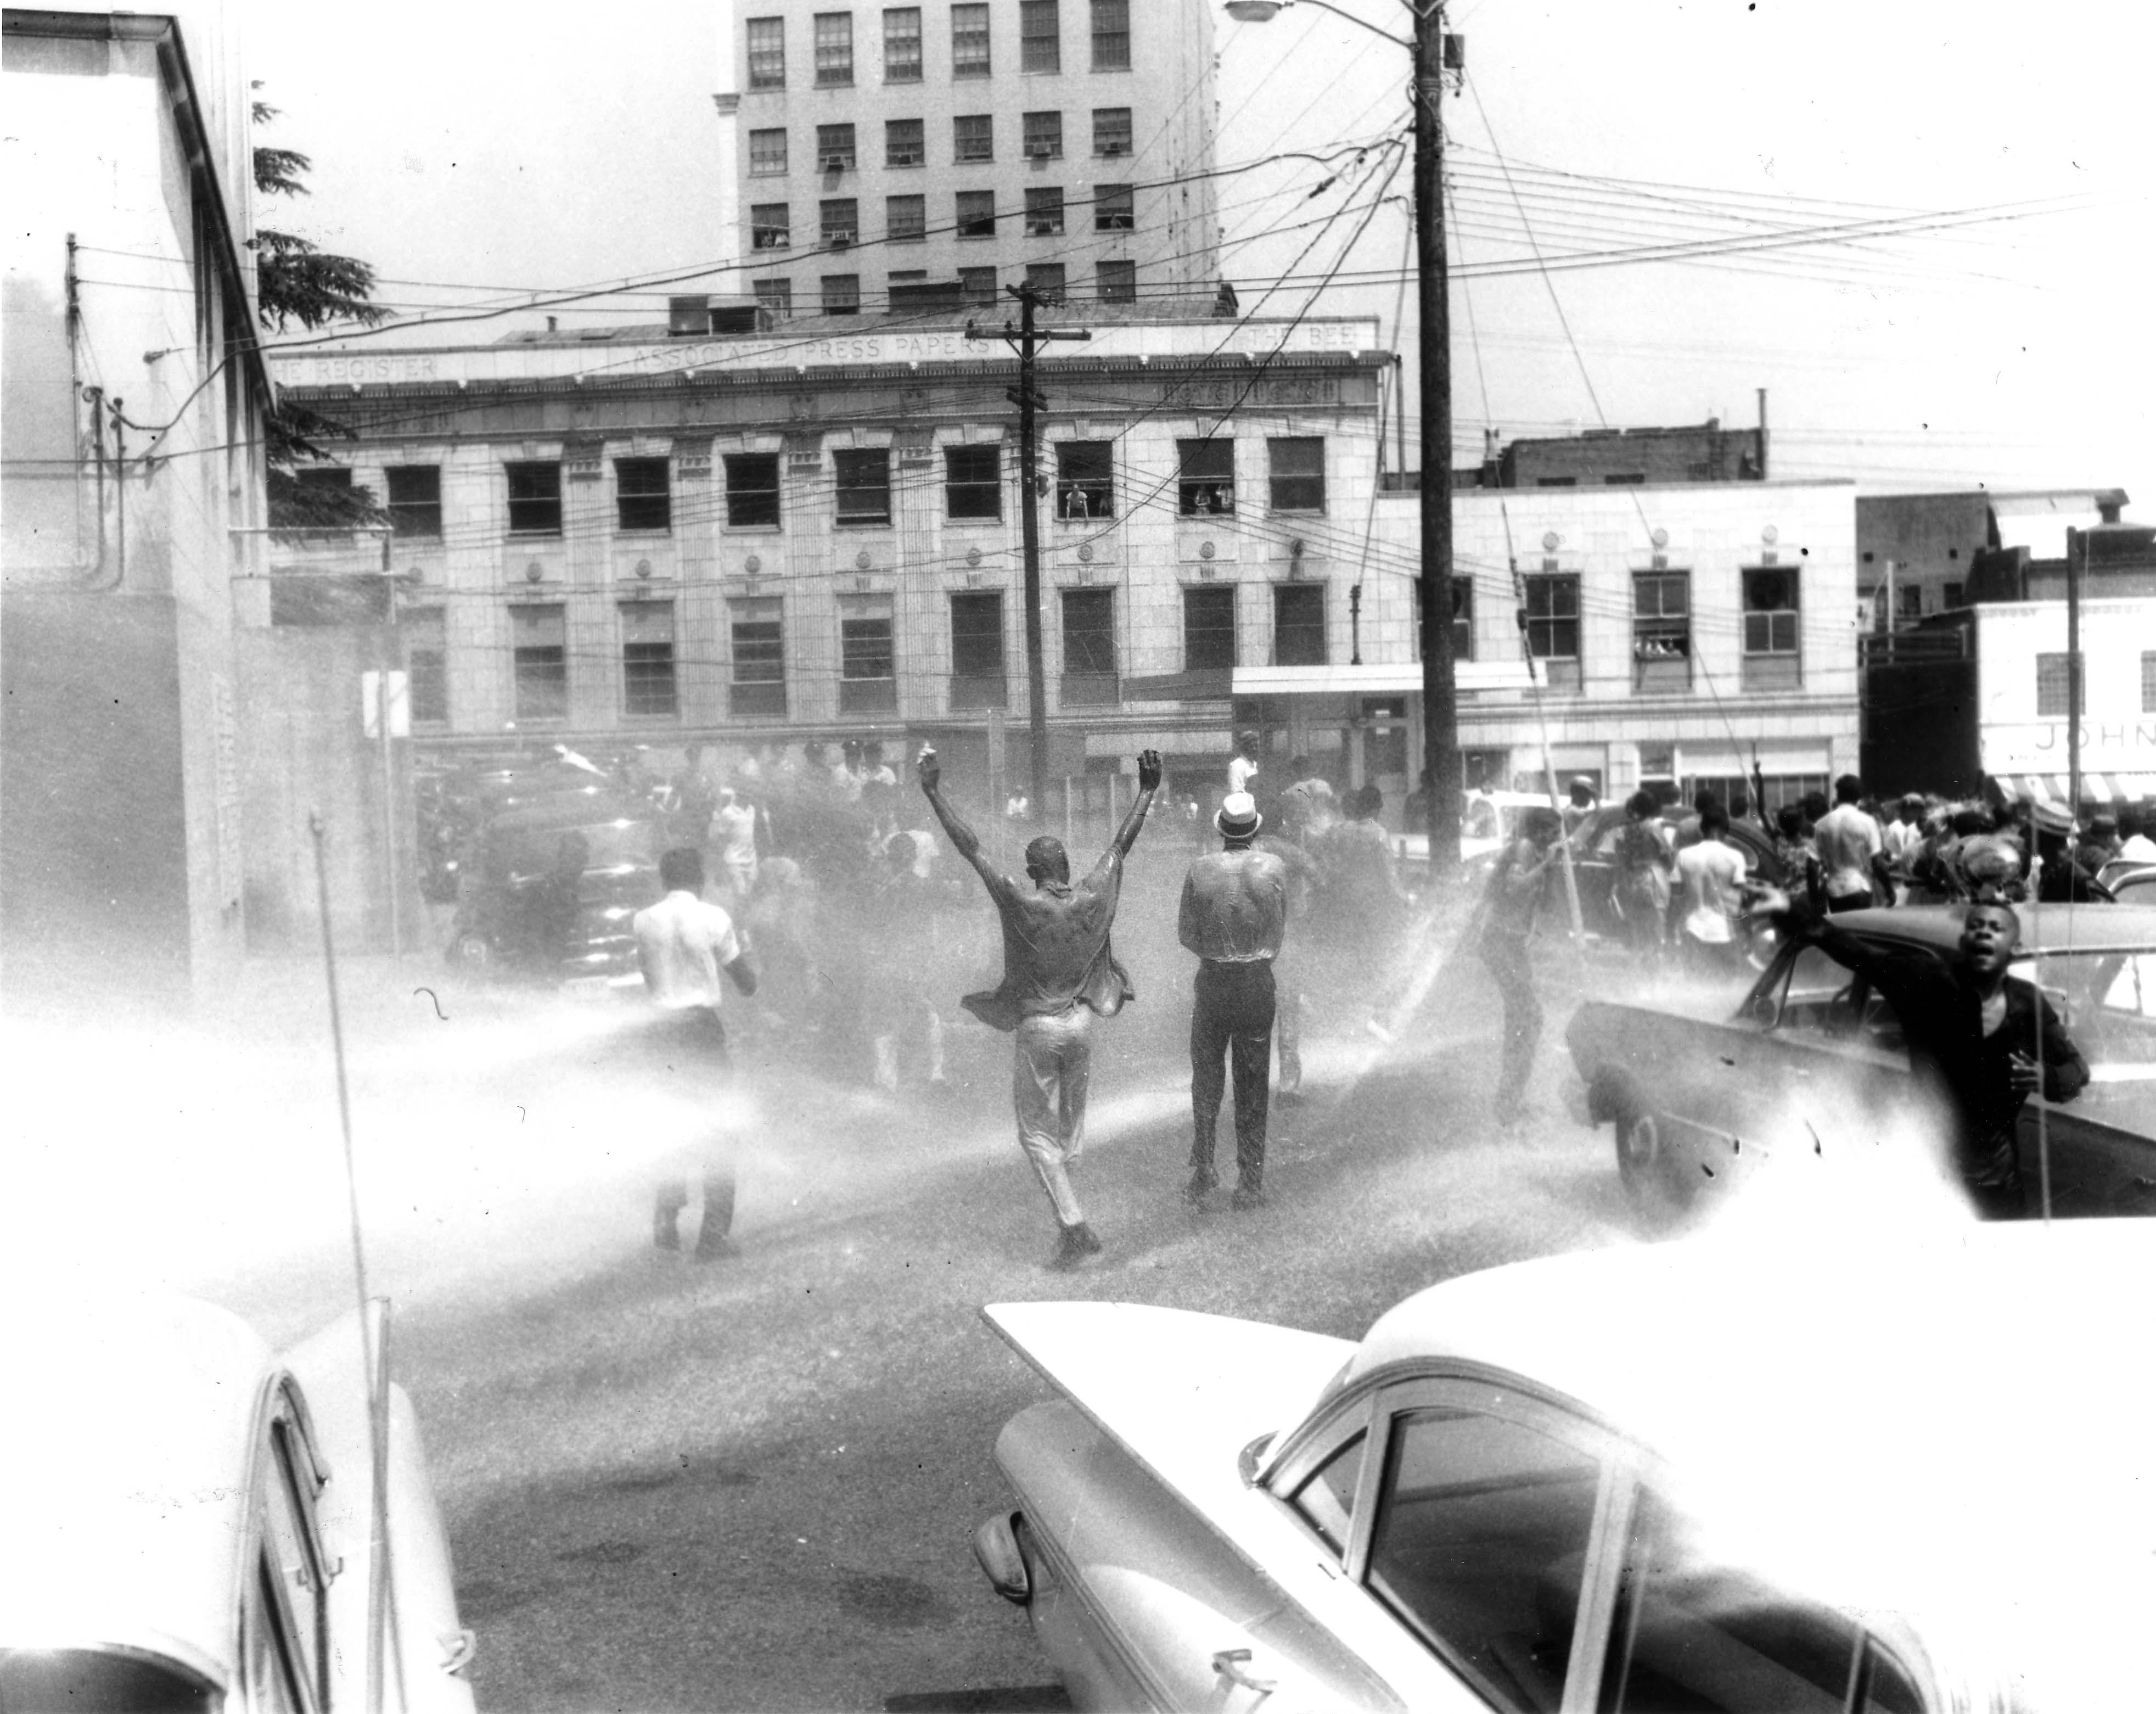 DANVILLE 1960S